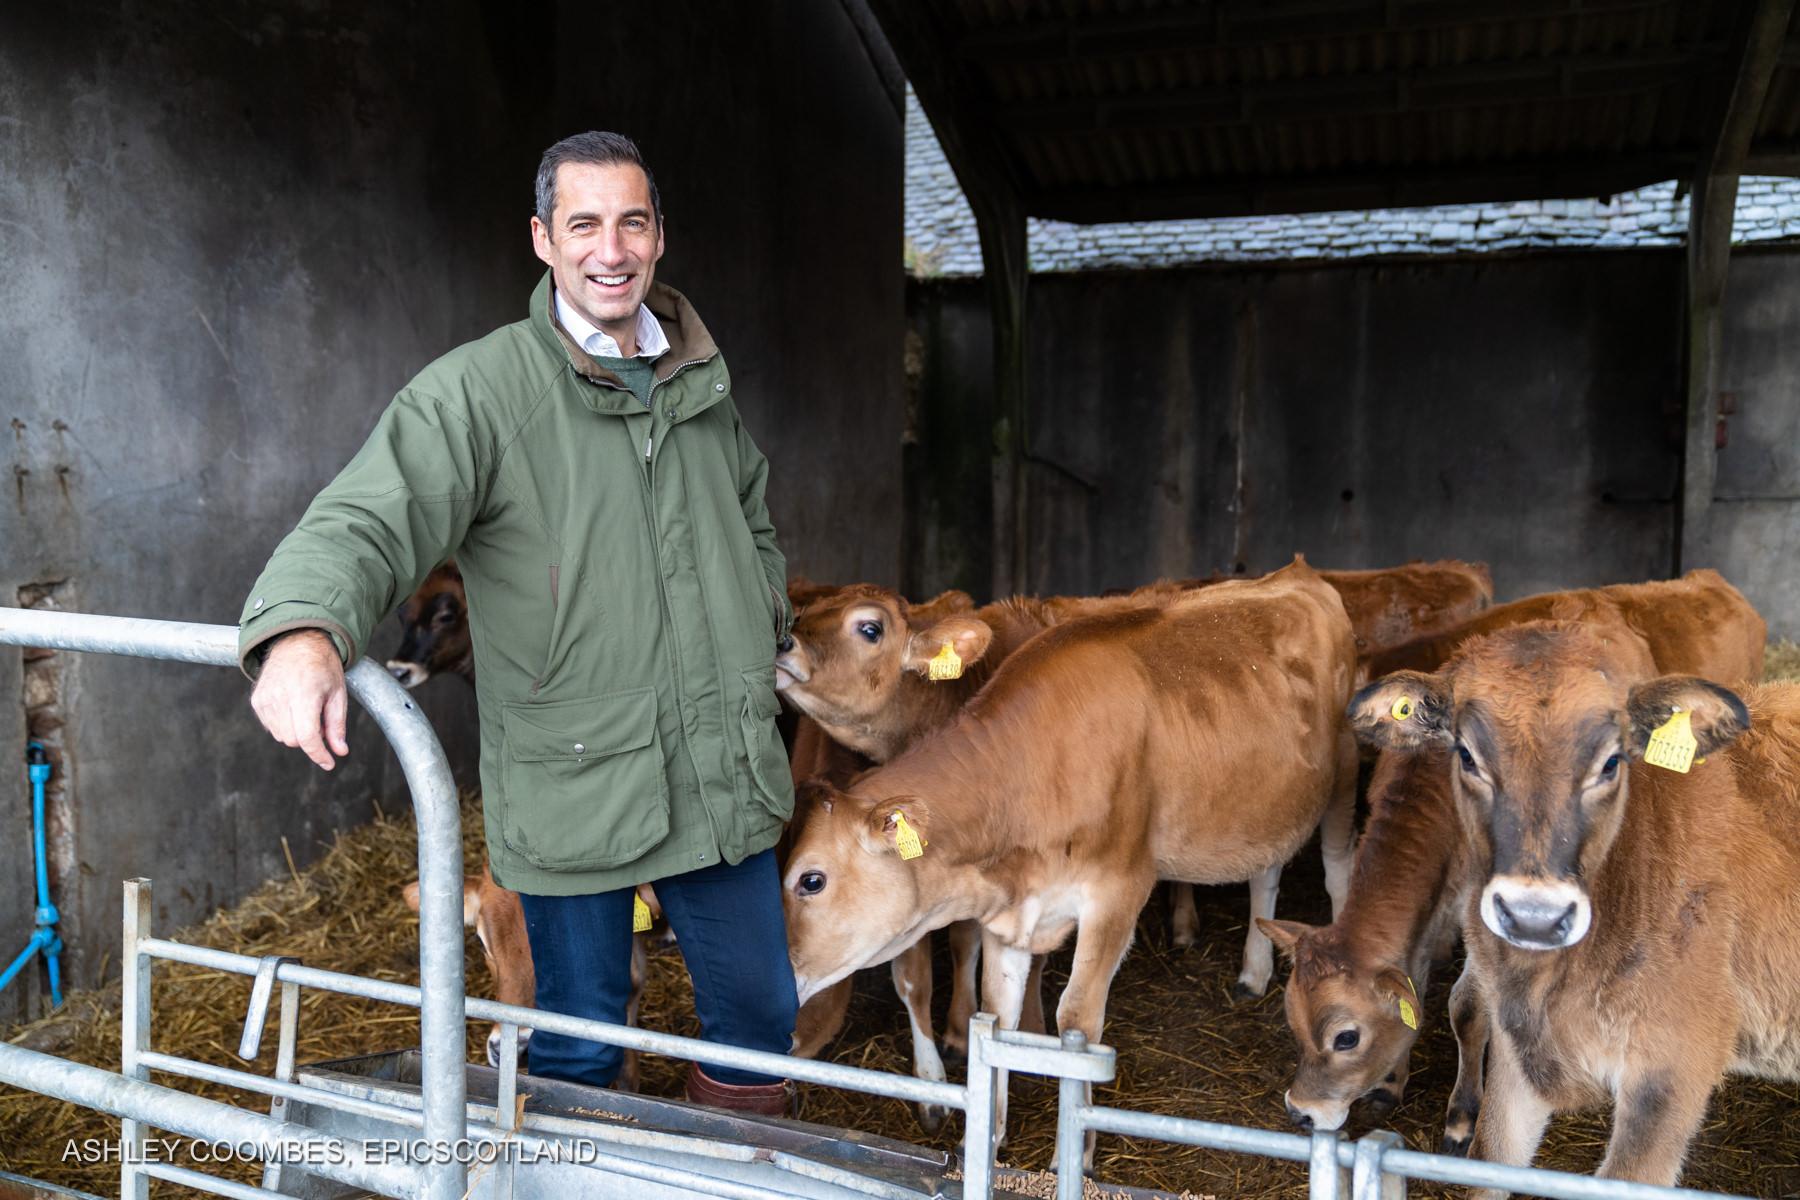 Business Portraits Graham's Dairy Farm Epic Scotland Photography